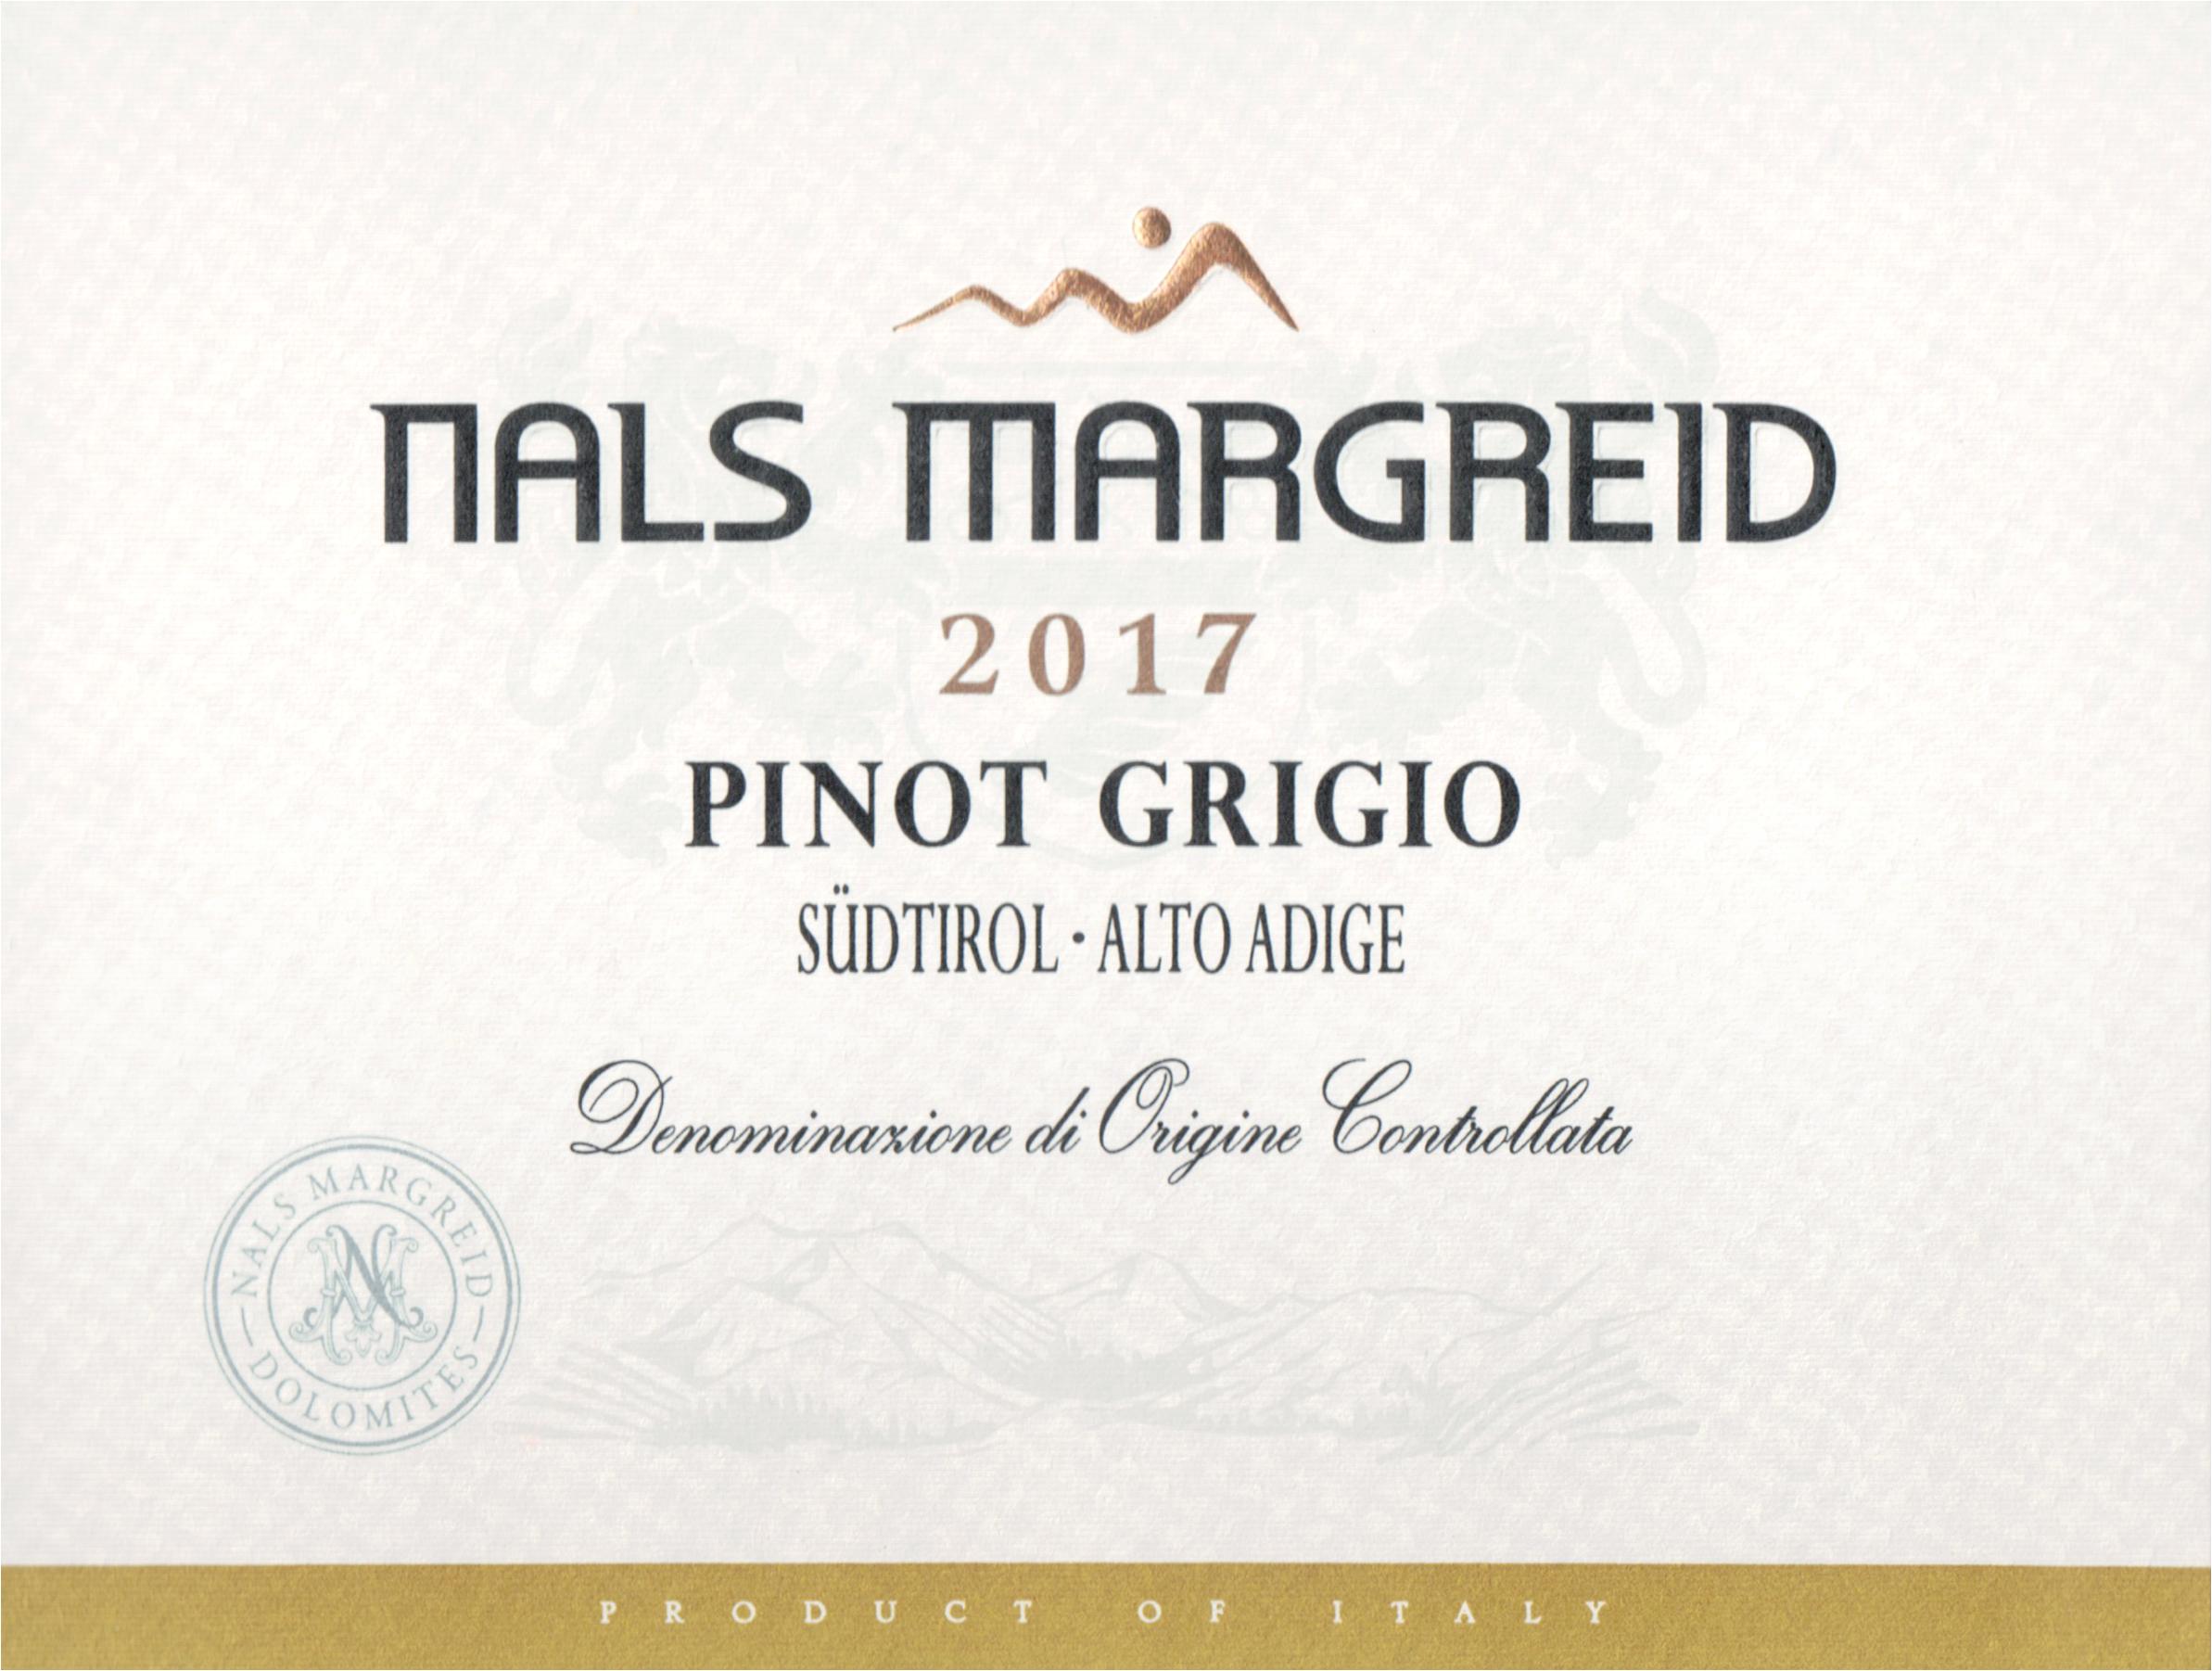 Nals Margreid Pinot Grigio Alto Adige 2017